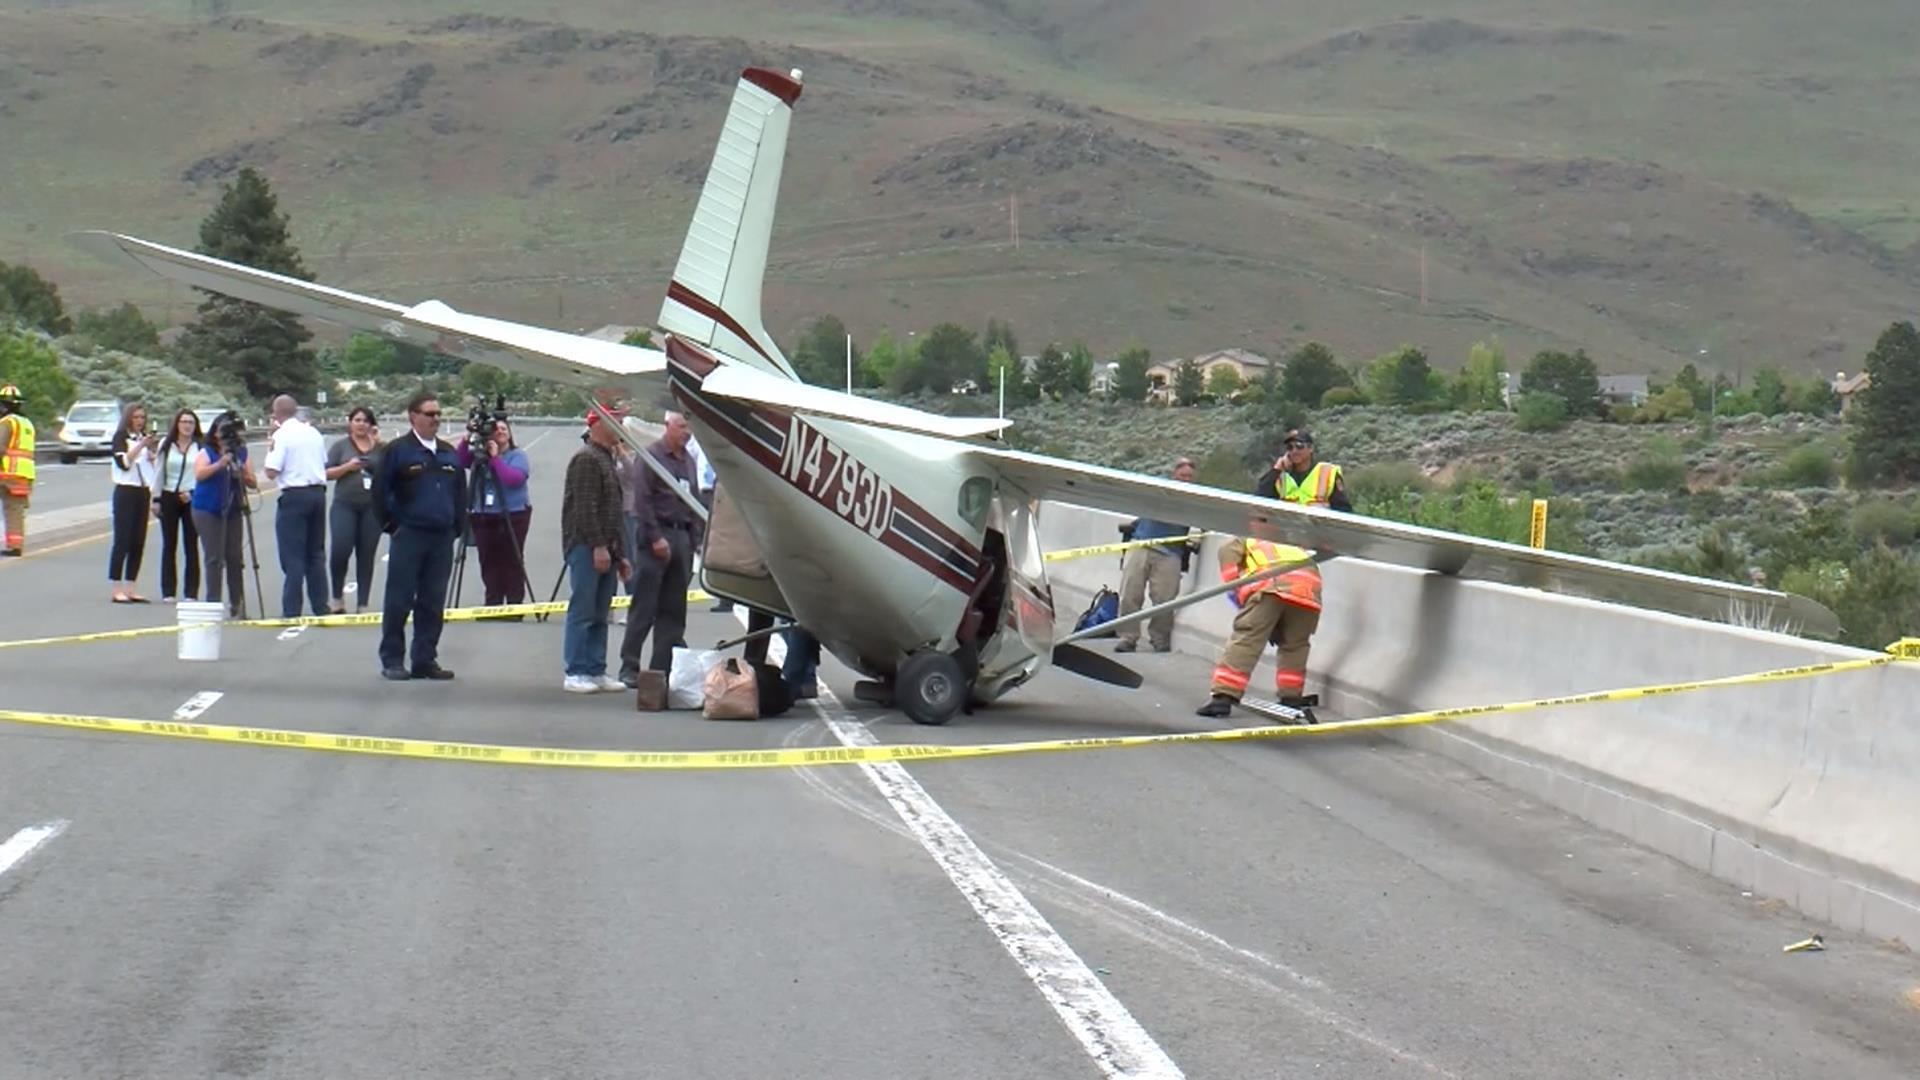 Small Plane Makes Emergency Landing on Nevada Road